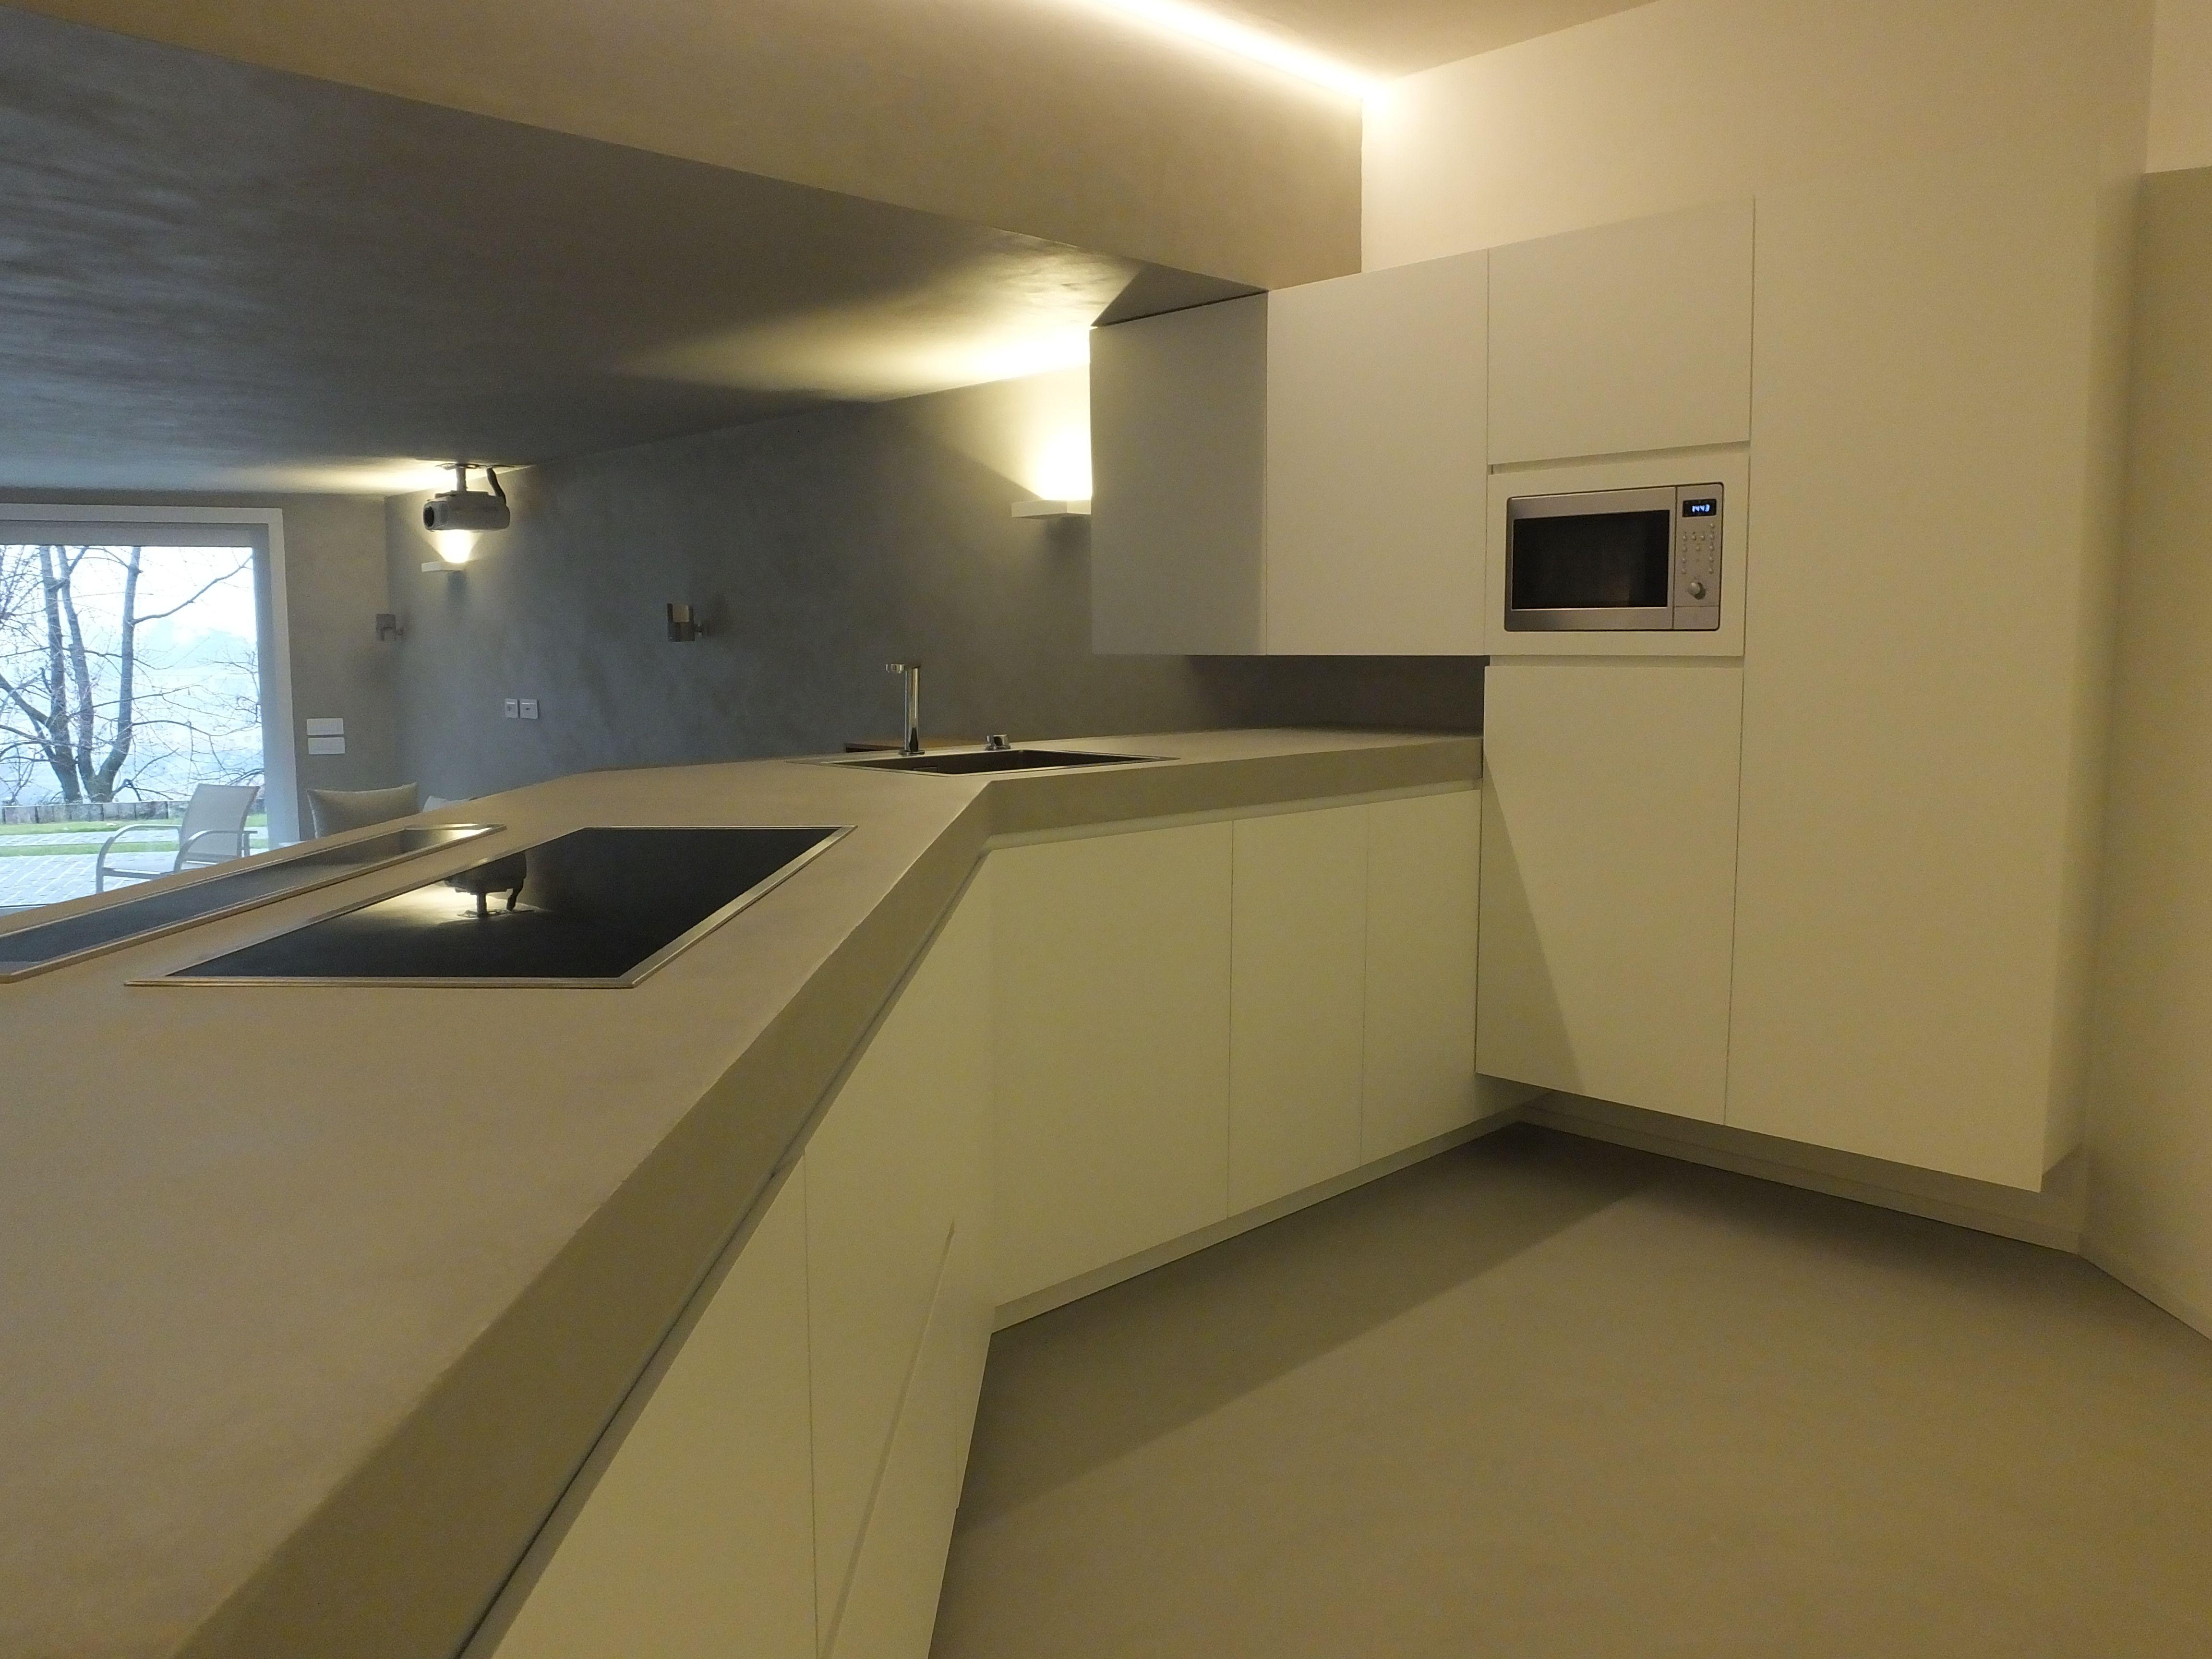 FRIGERIO PAOLO & C. - info@frigeriopaolo.it - Cucine ...